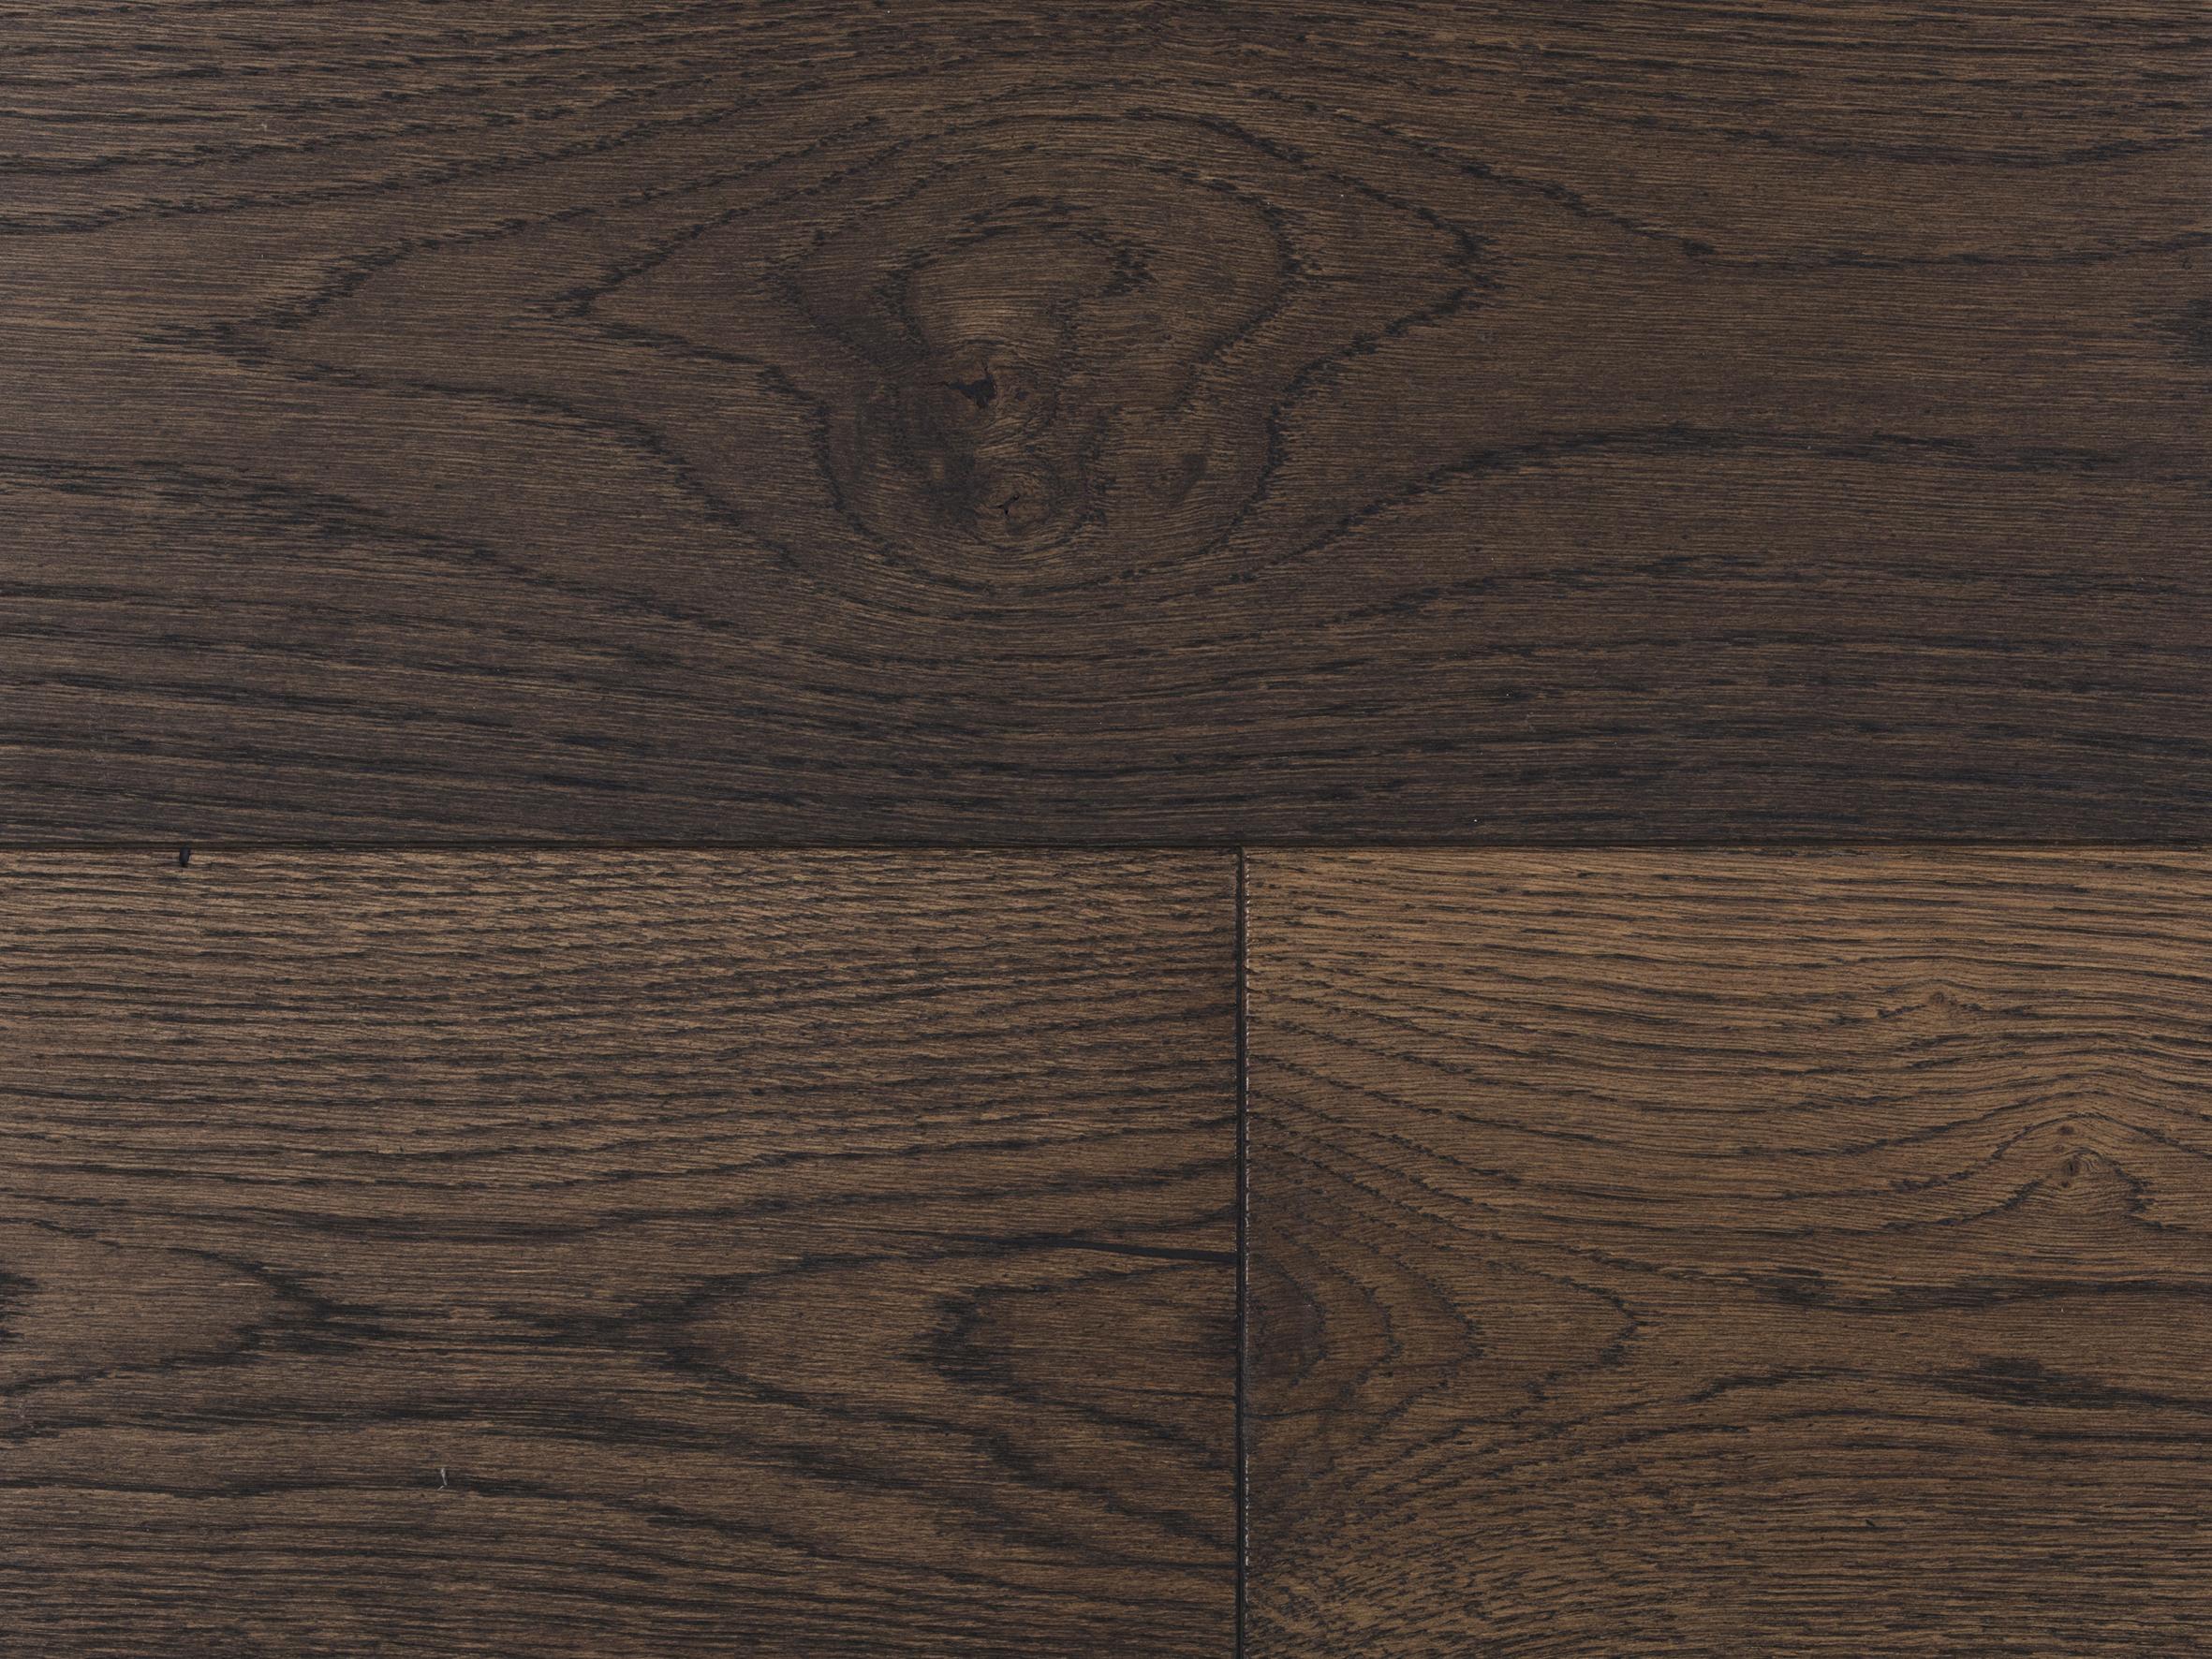 Oak Rustic Milano